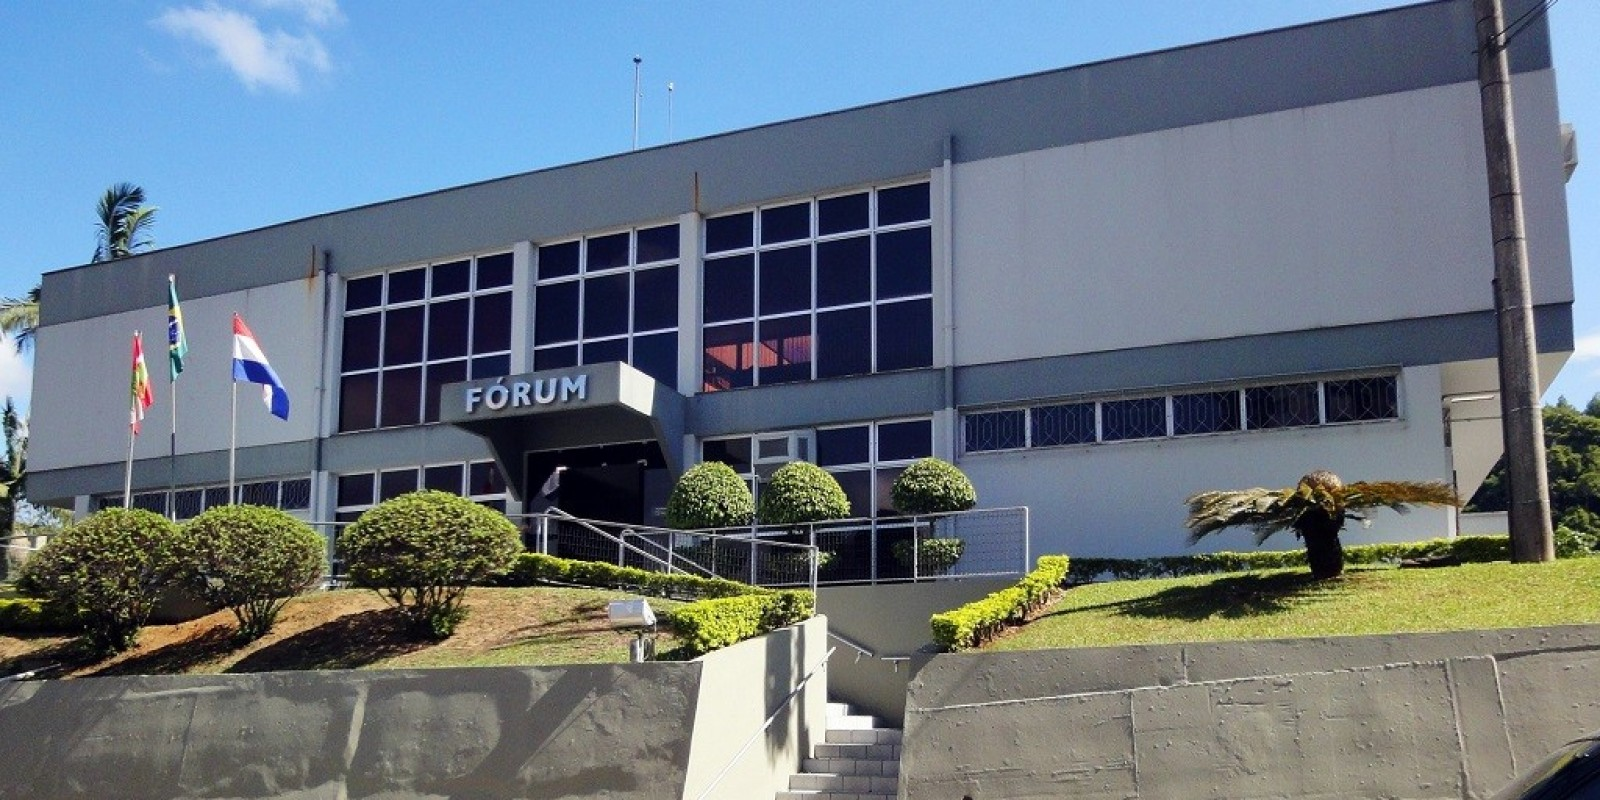 Justiça de Orleans suspende decreto que limitou funcionamento de supermercados no município